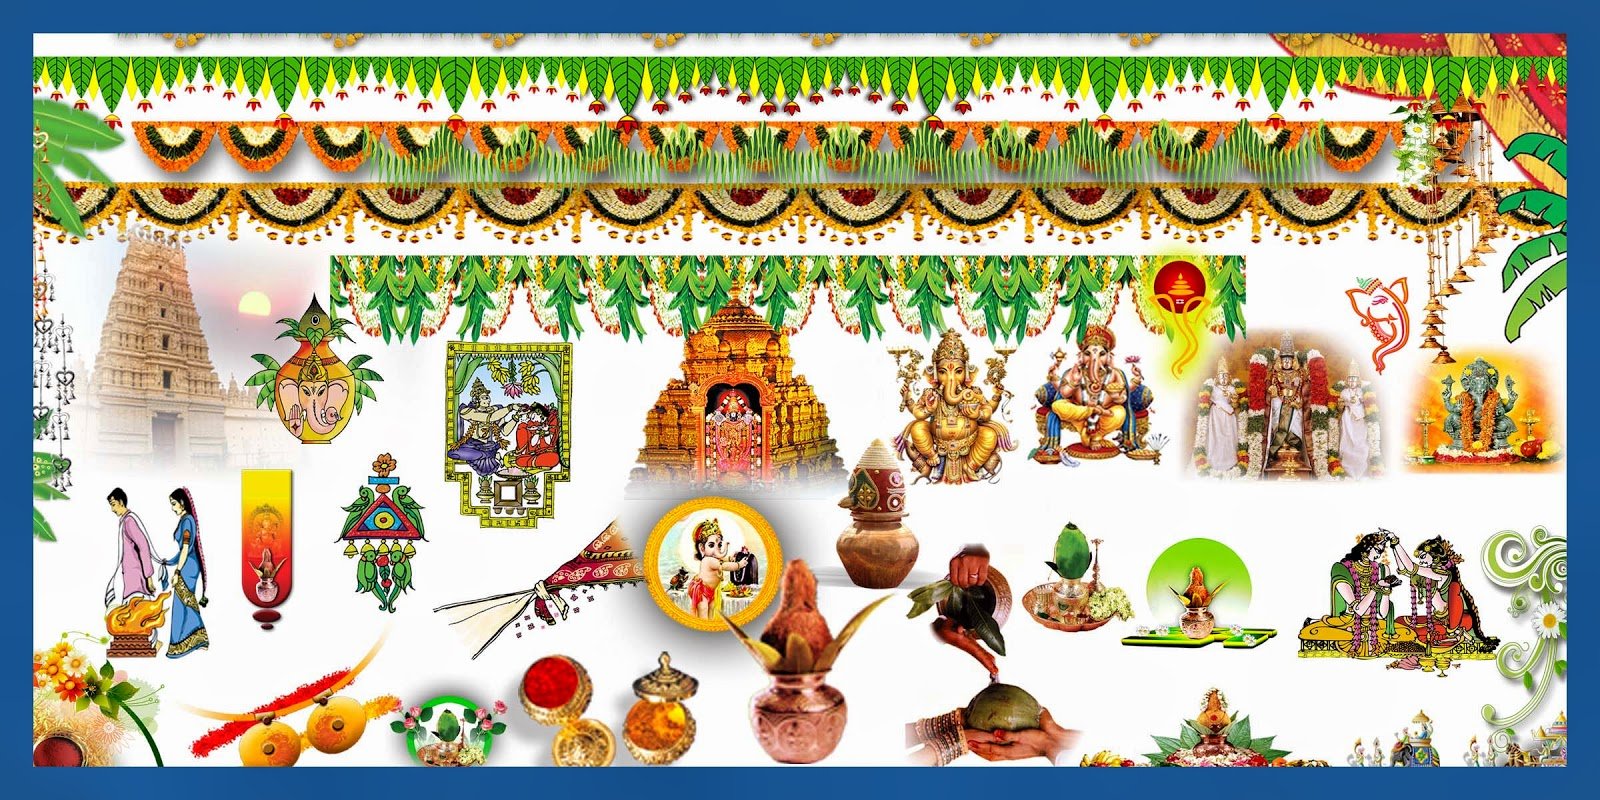 Wedding psd clipart svg freeuse download Hindu wedding clipart psd 8 » Clipart Station svg freeuse download